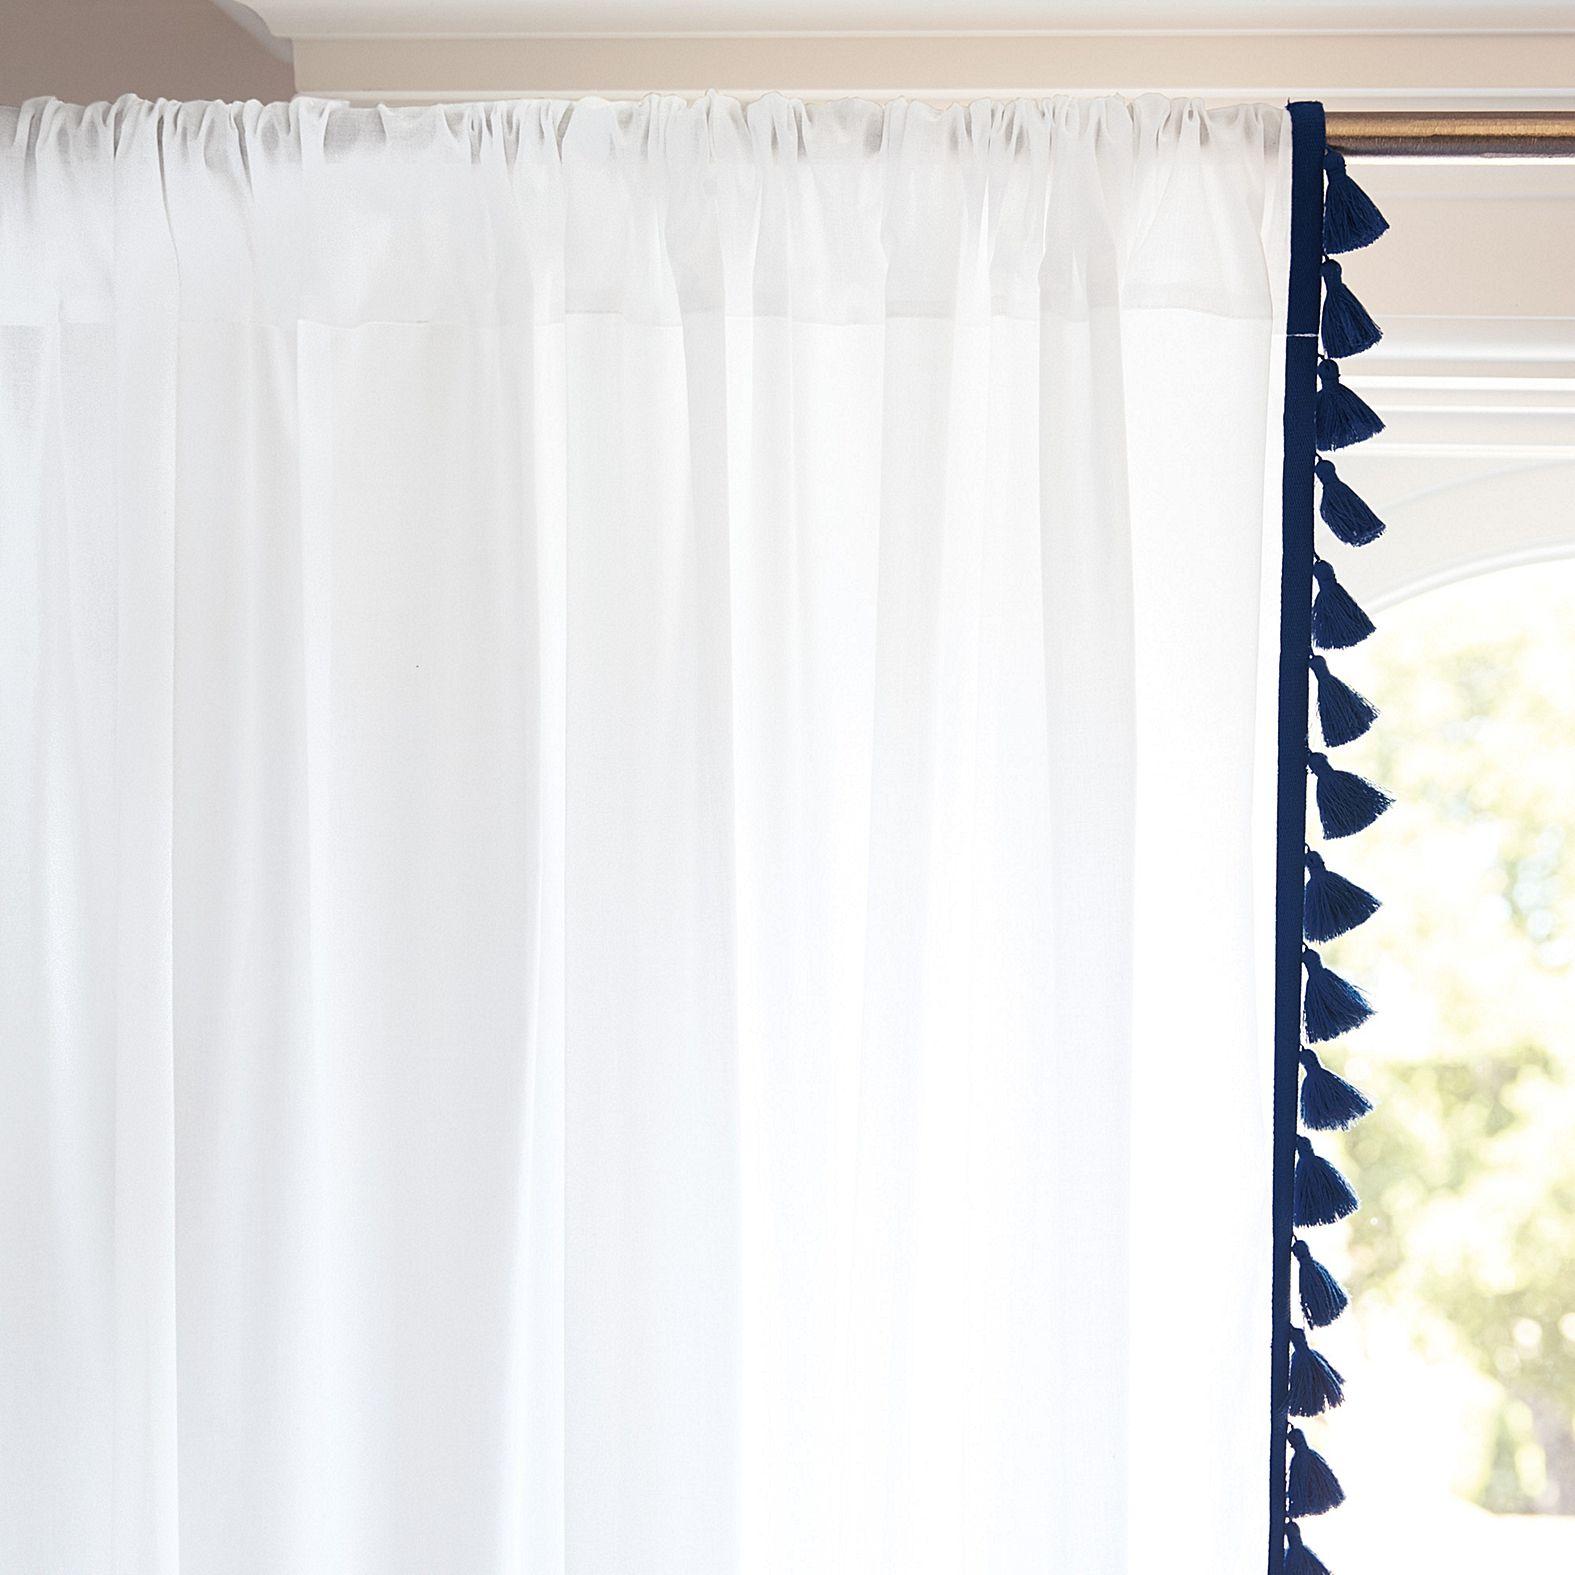 French Tassel Window Panel Navy Serena Lily Tassel